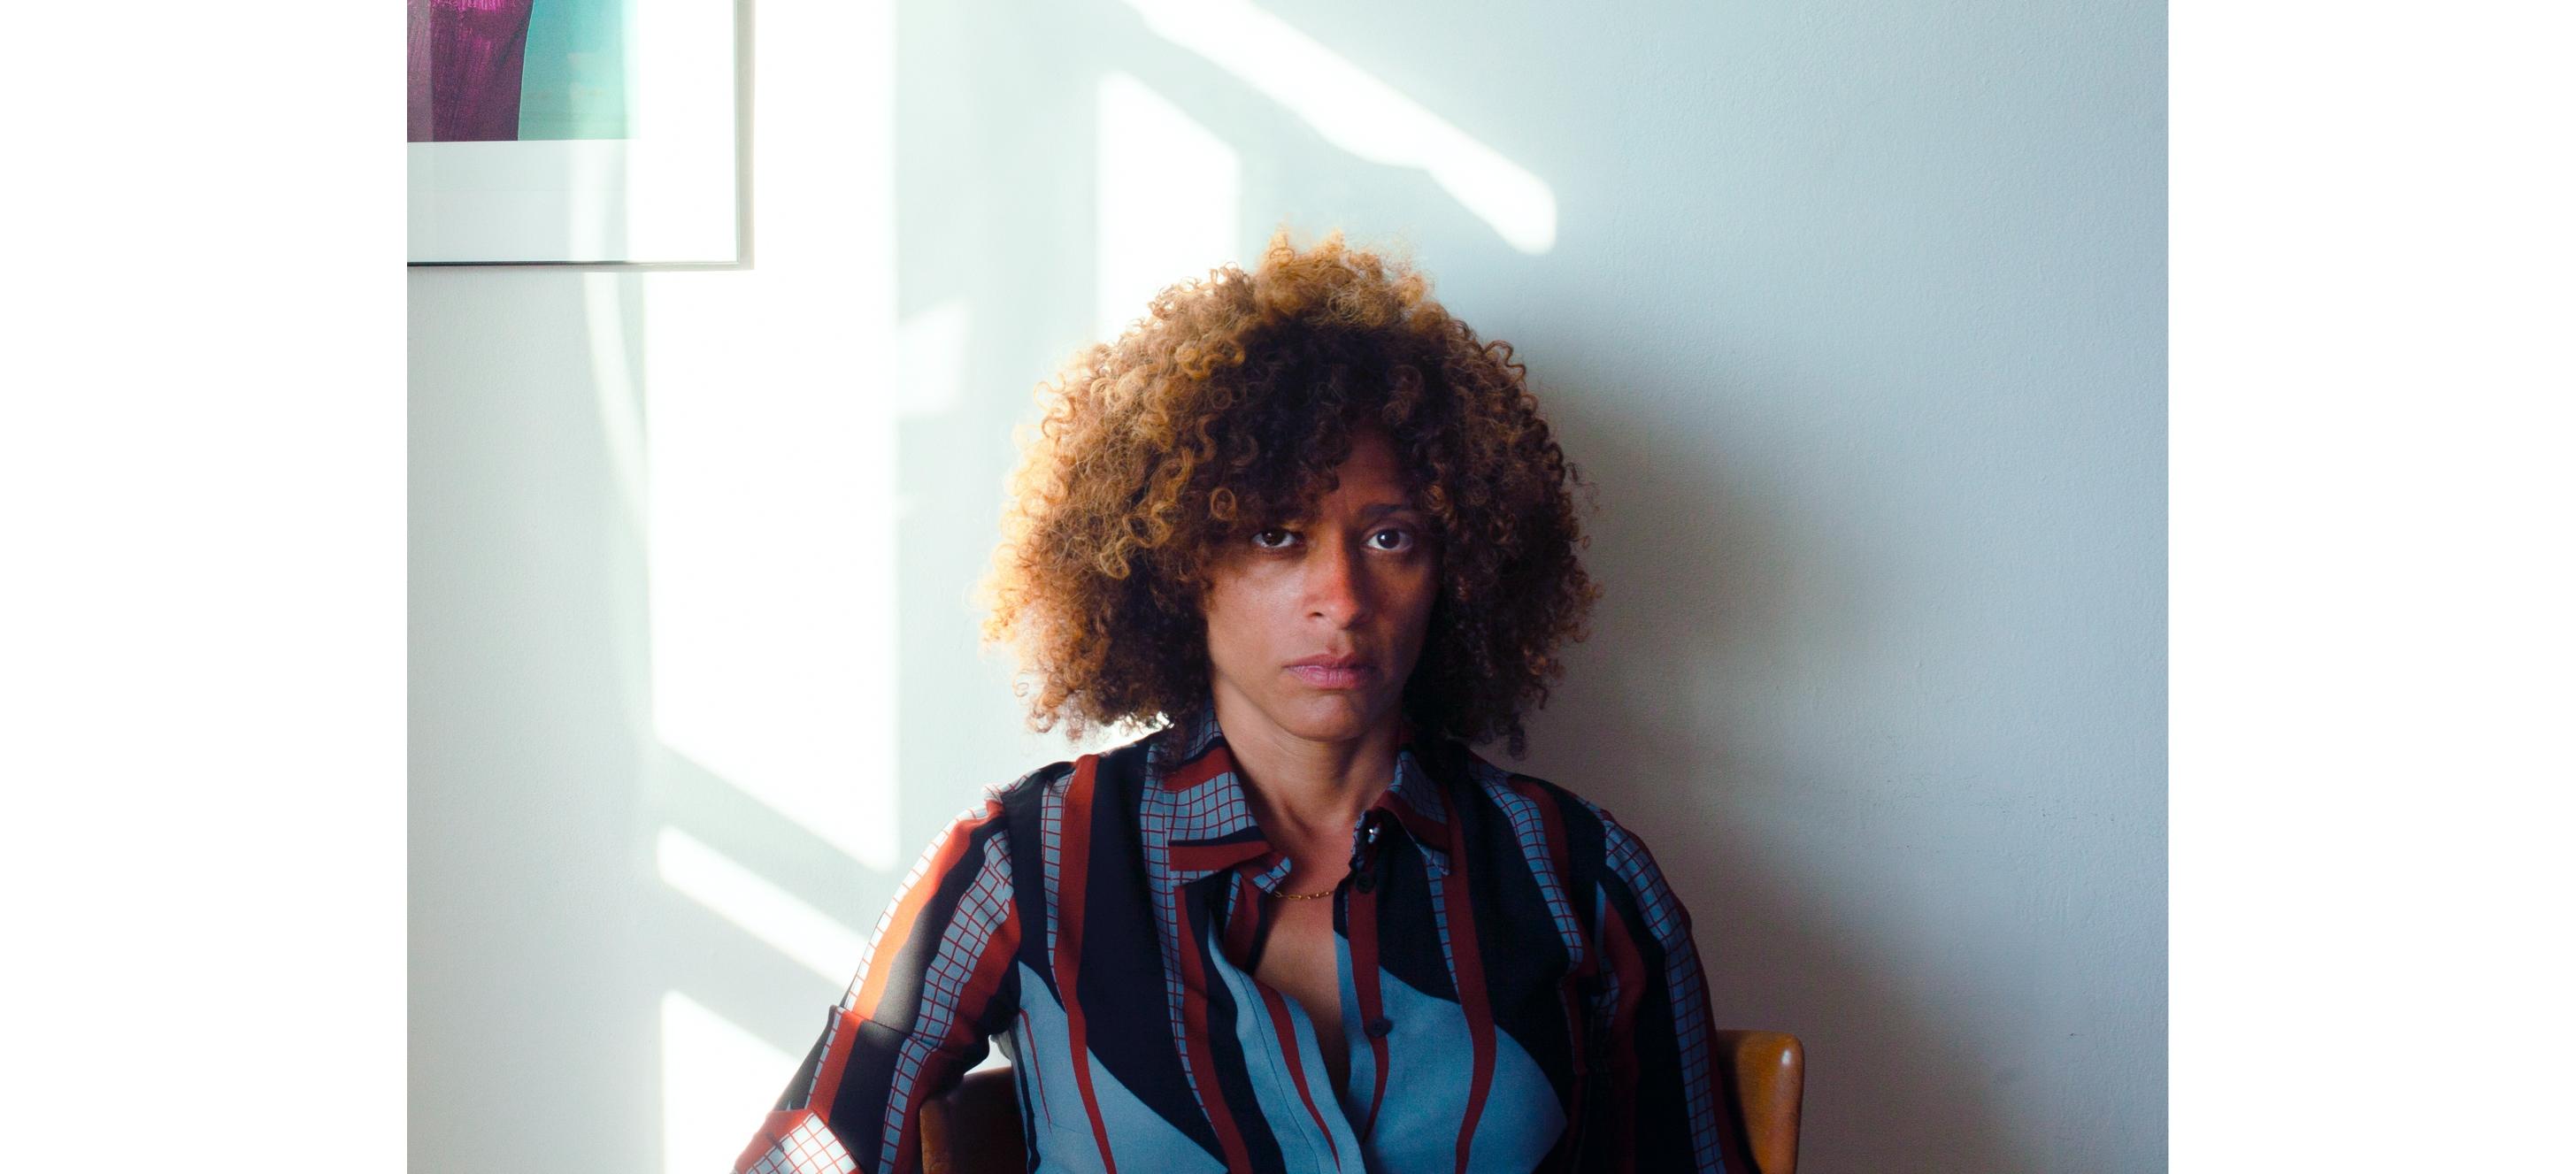 Director Nadia Hallgren